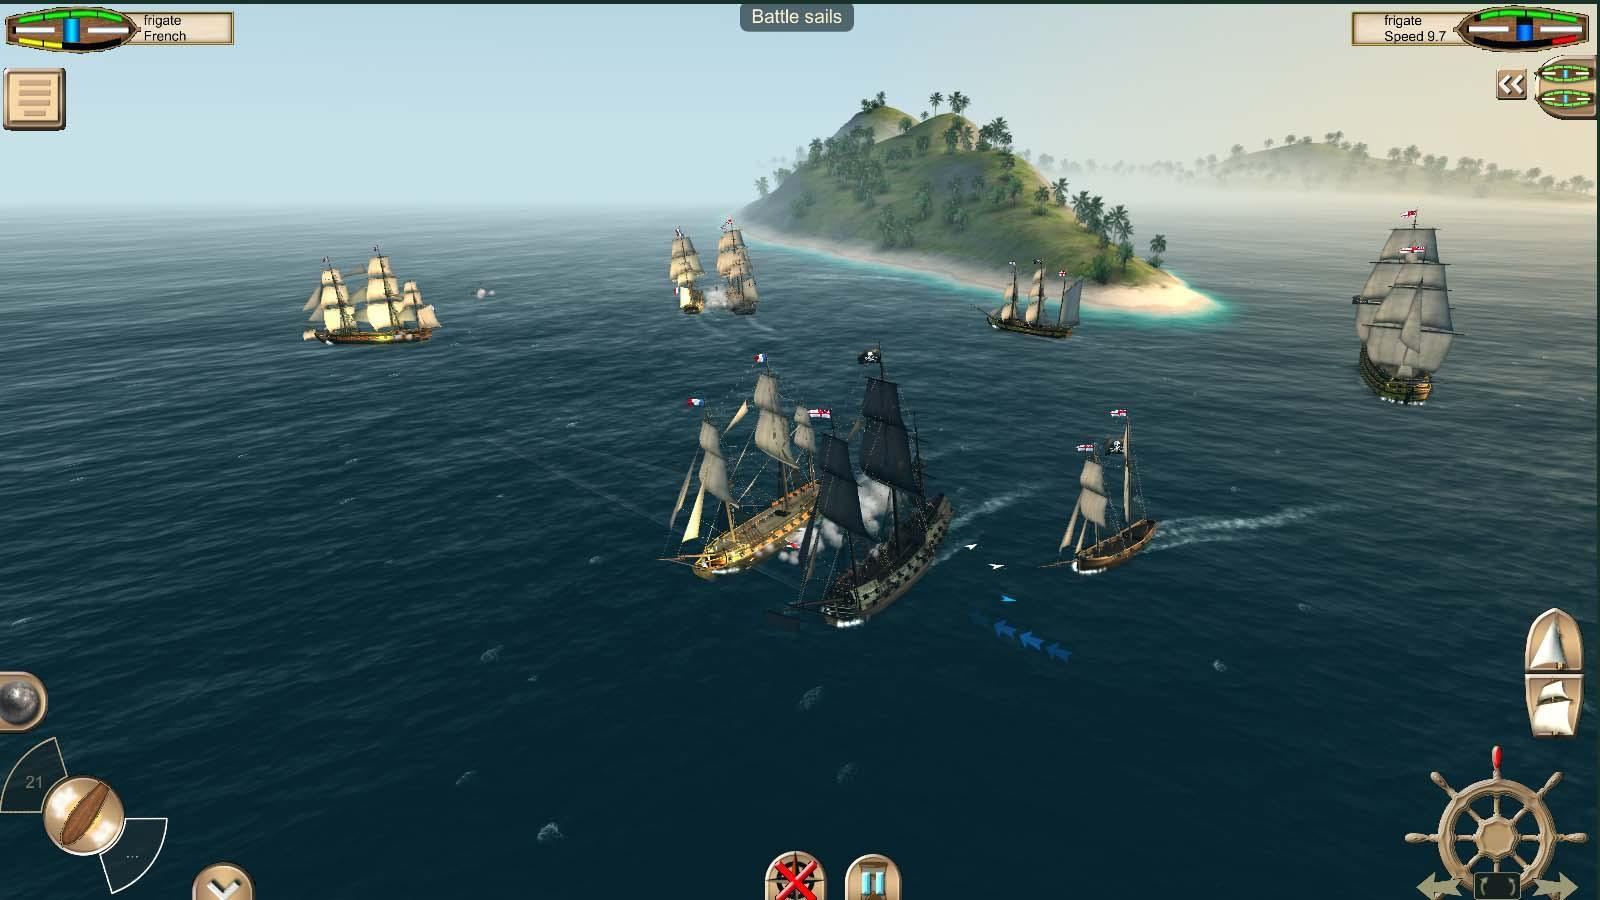 تحميل لعبة حرب سفن القراصنة The Pirate: Caribbean Sumber